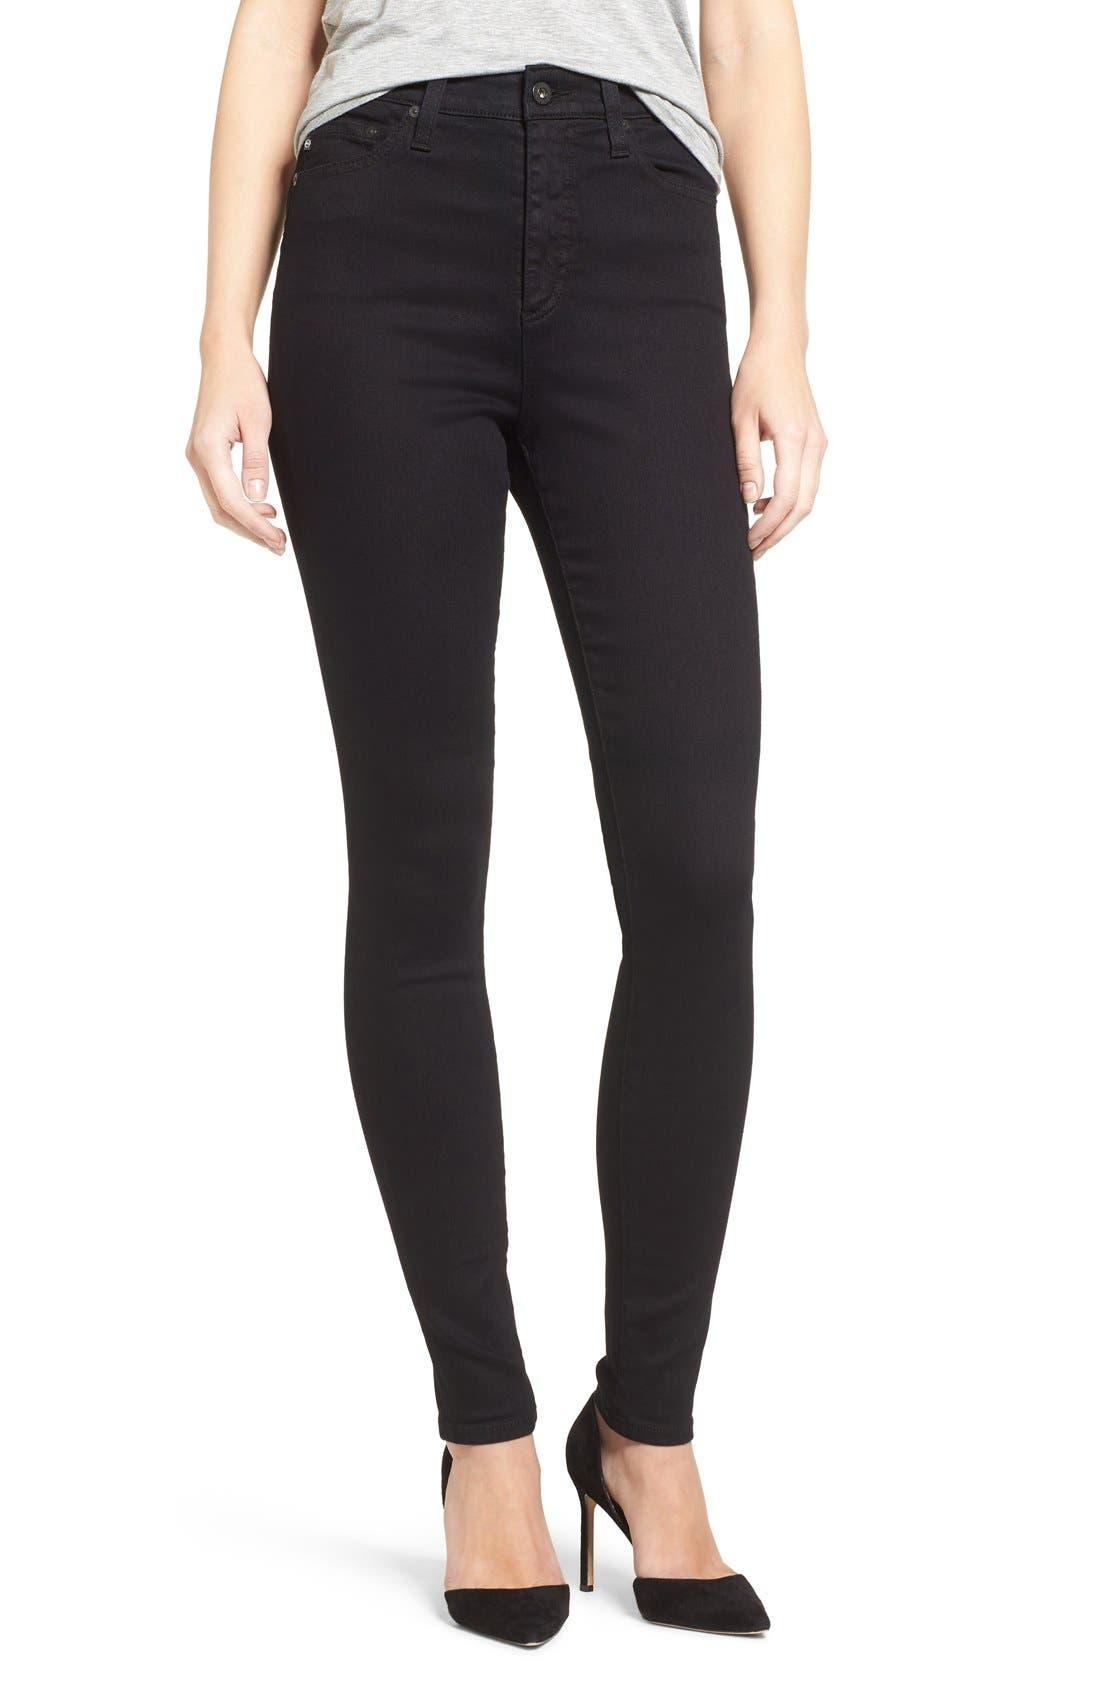 Mila High Rise Skinny Jeans,                             Main thumbnail 1, color,                             Over Dye Black